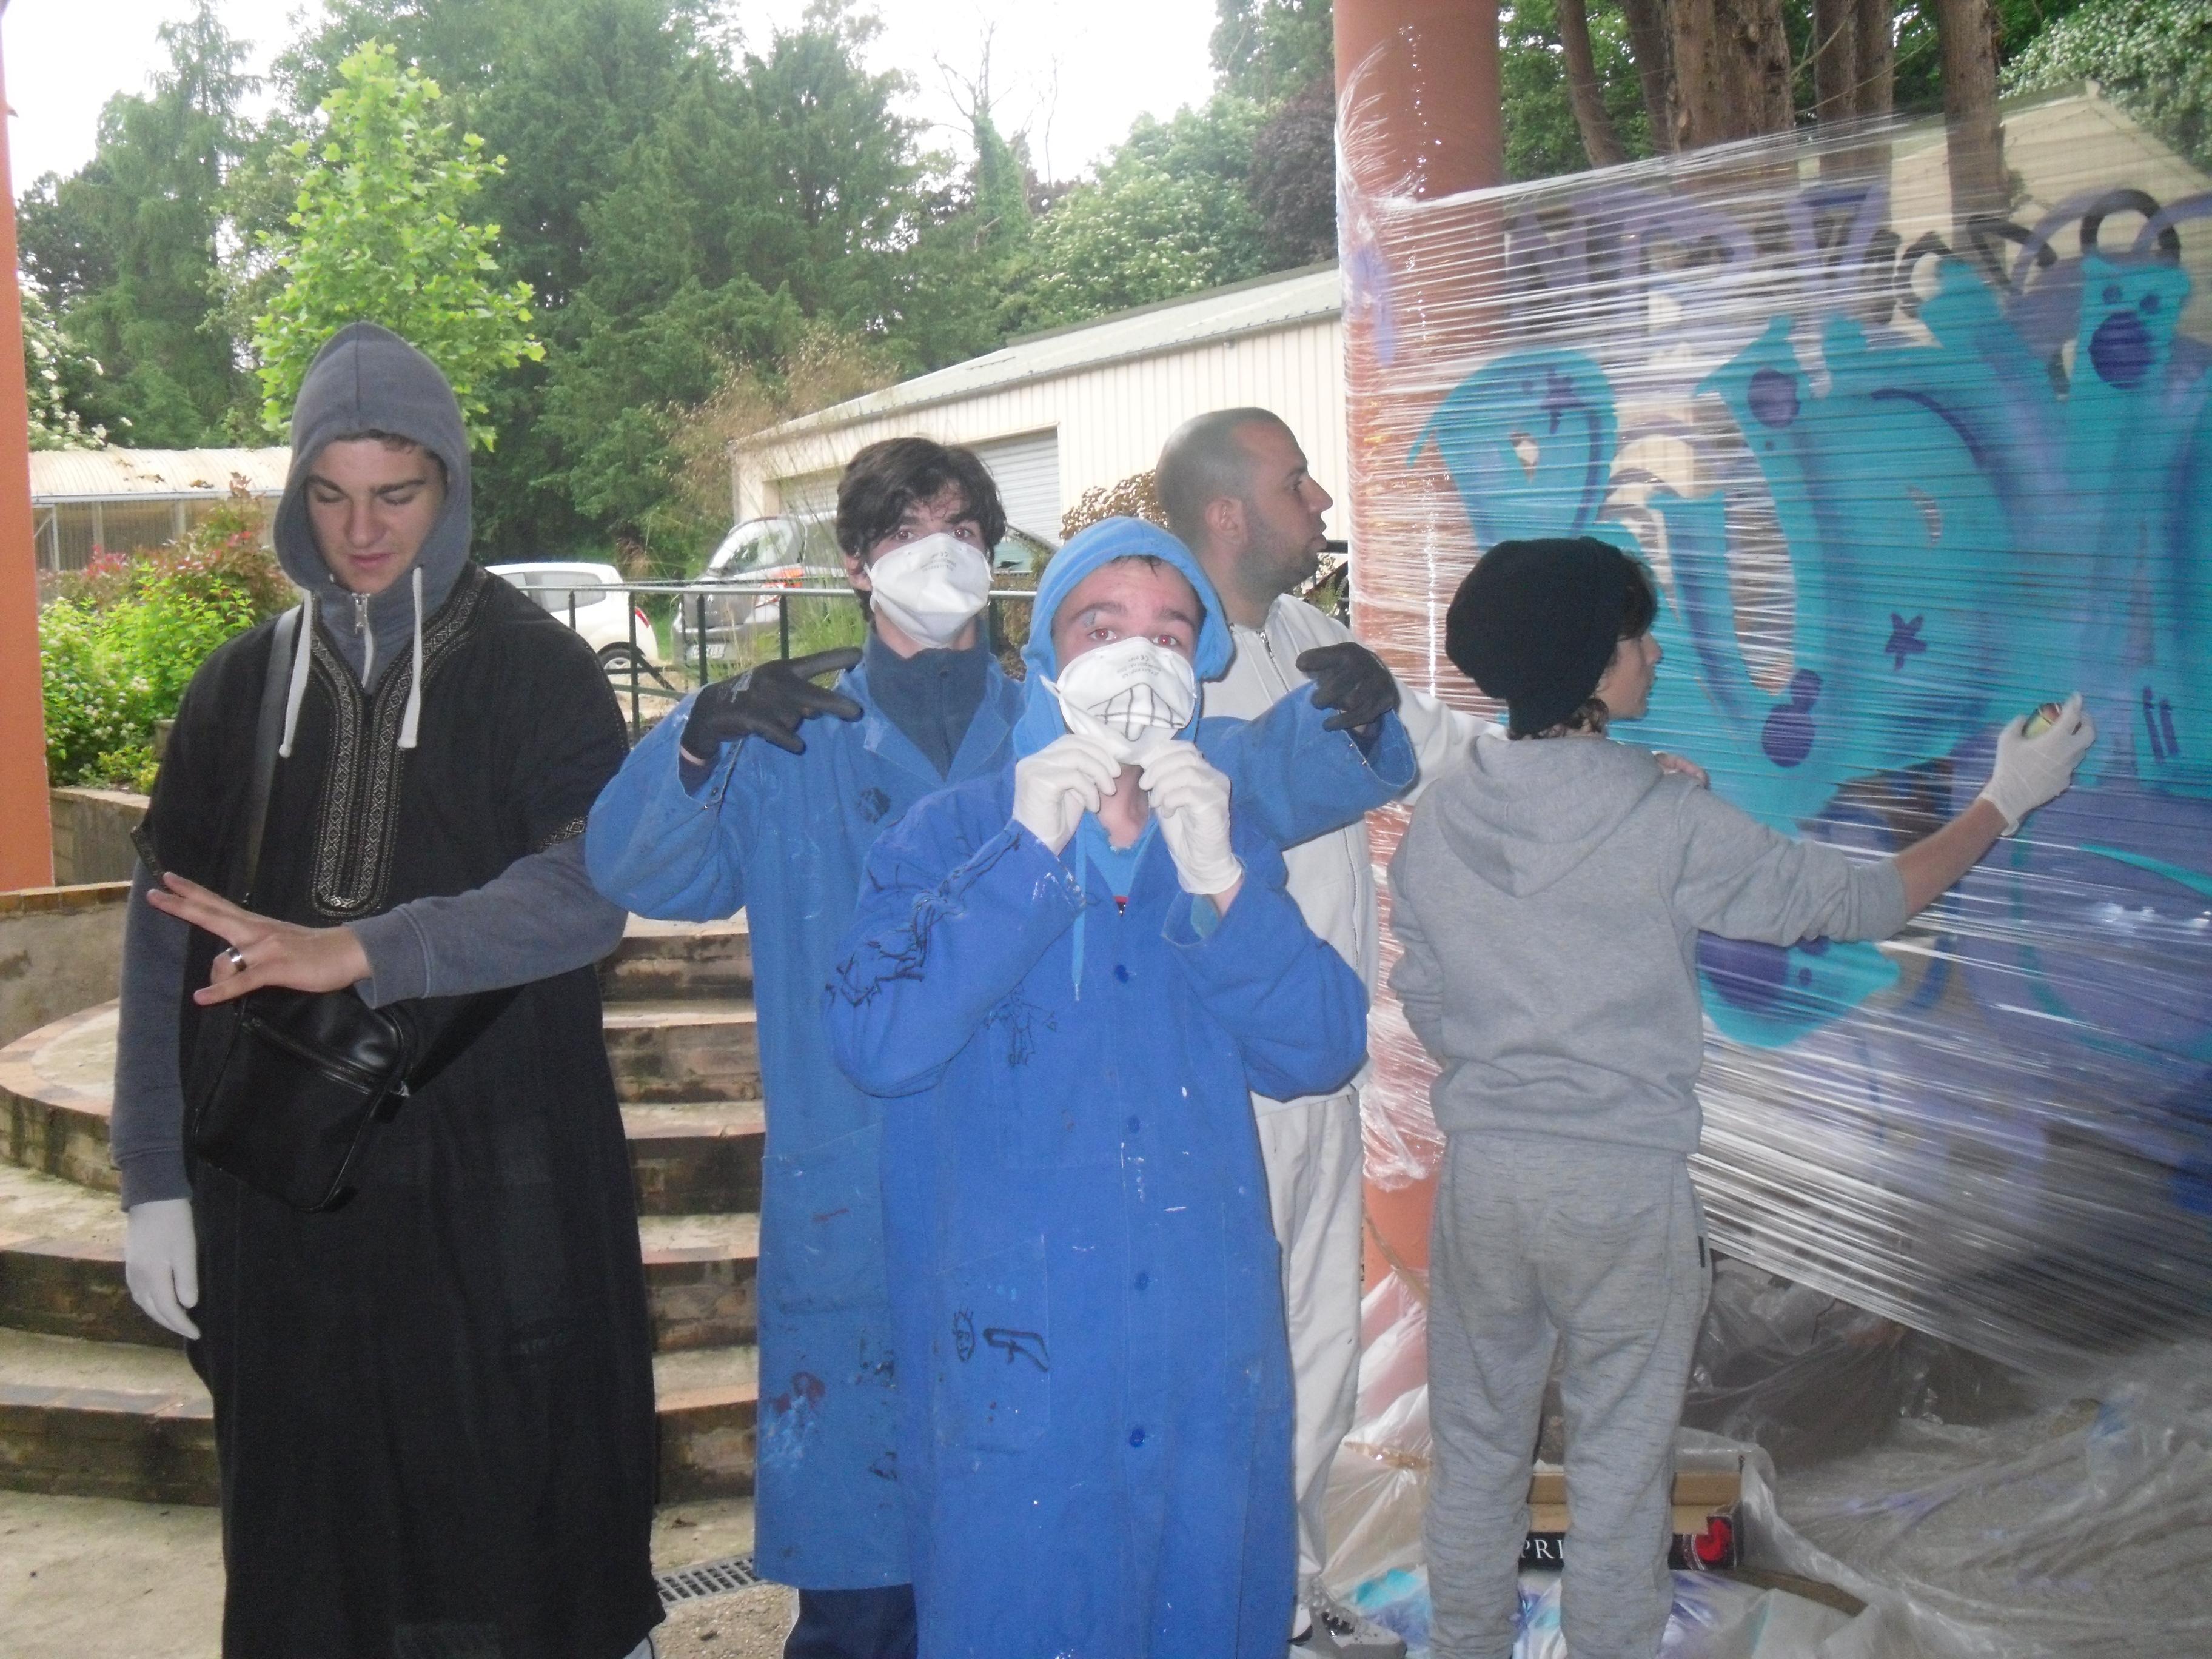 Les élèves testent la bombe